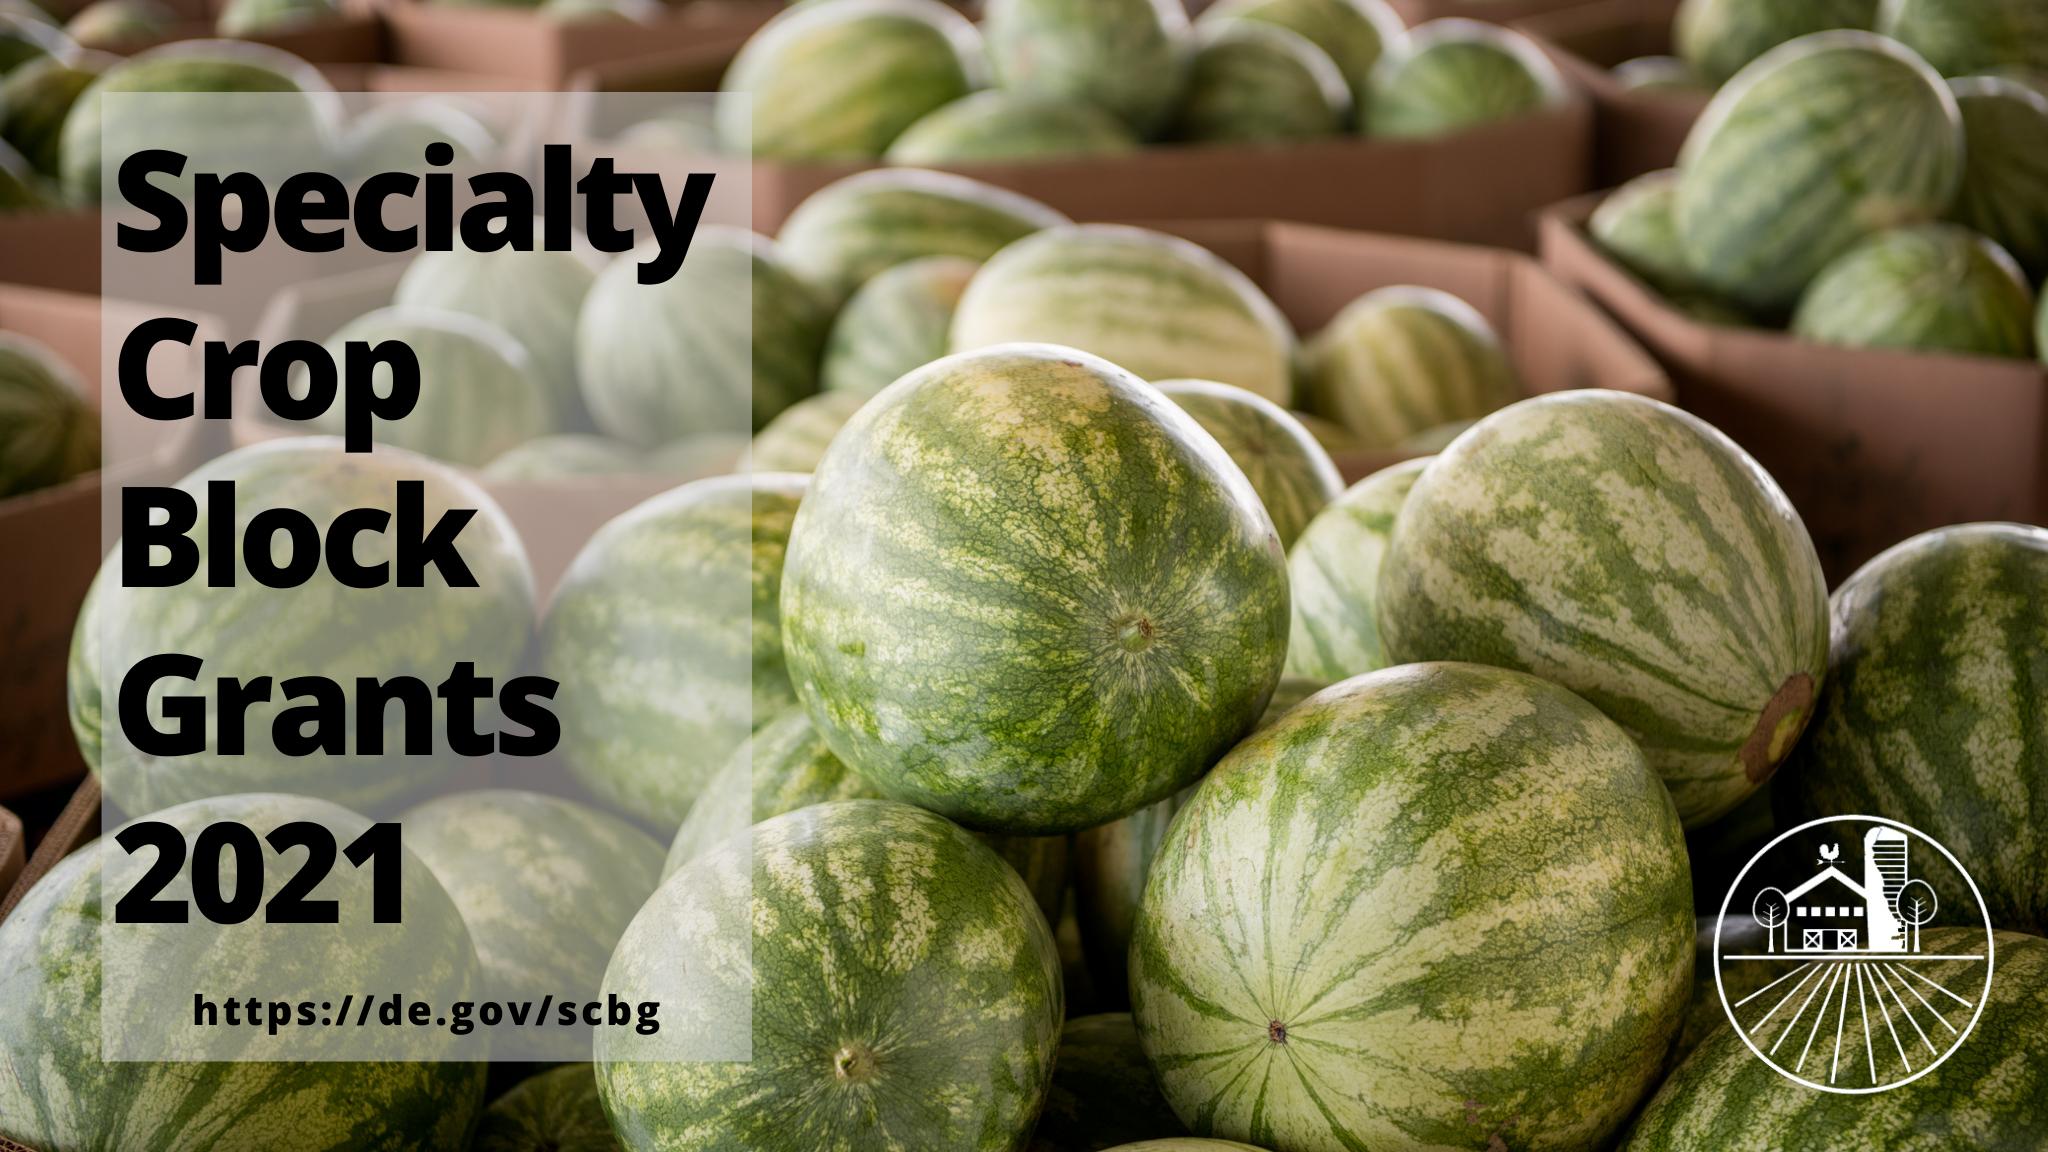 "Bins of Delaware Watermelon overlay with words"" Specialty Crop Block Grants 2021, Https://de.gov/scbg"" and the DDA logo"